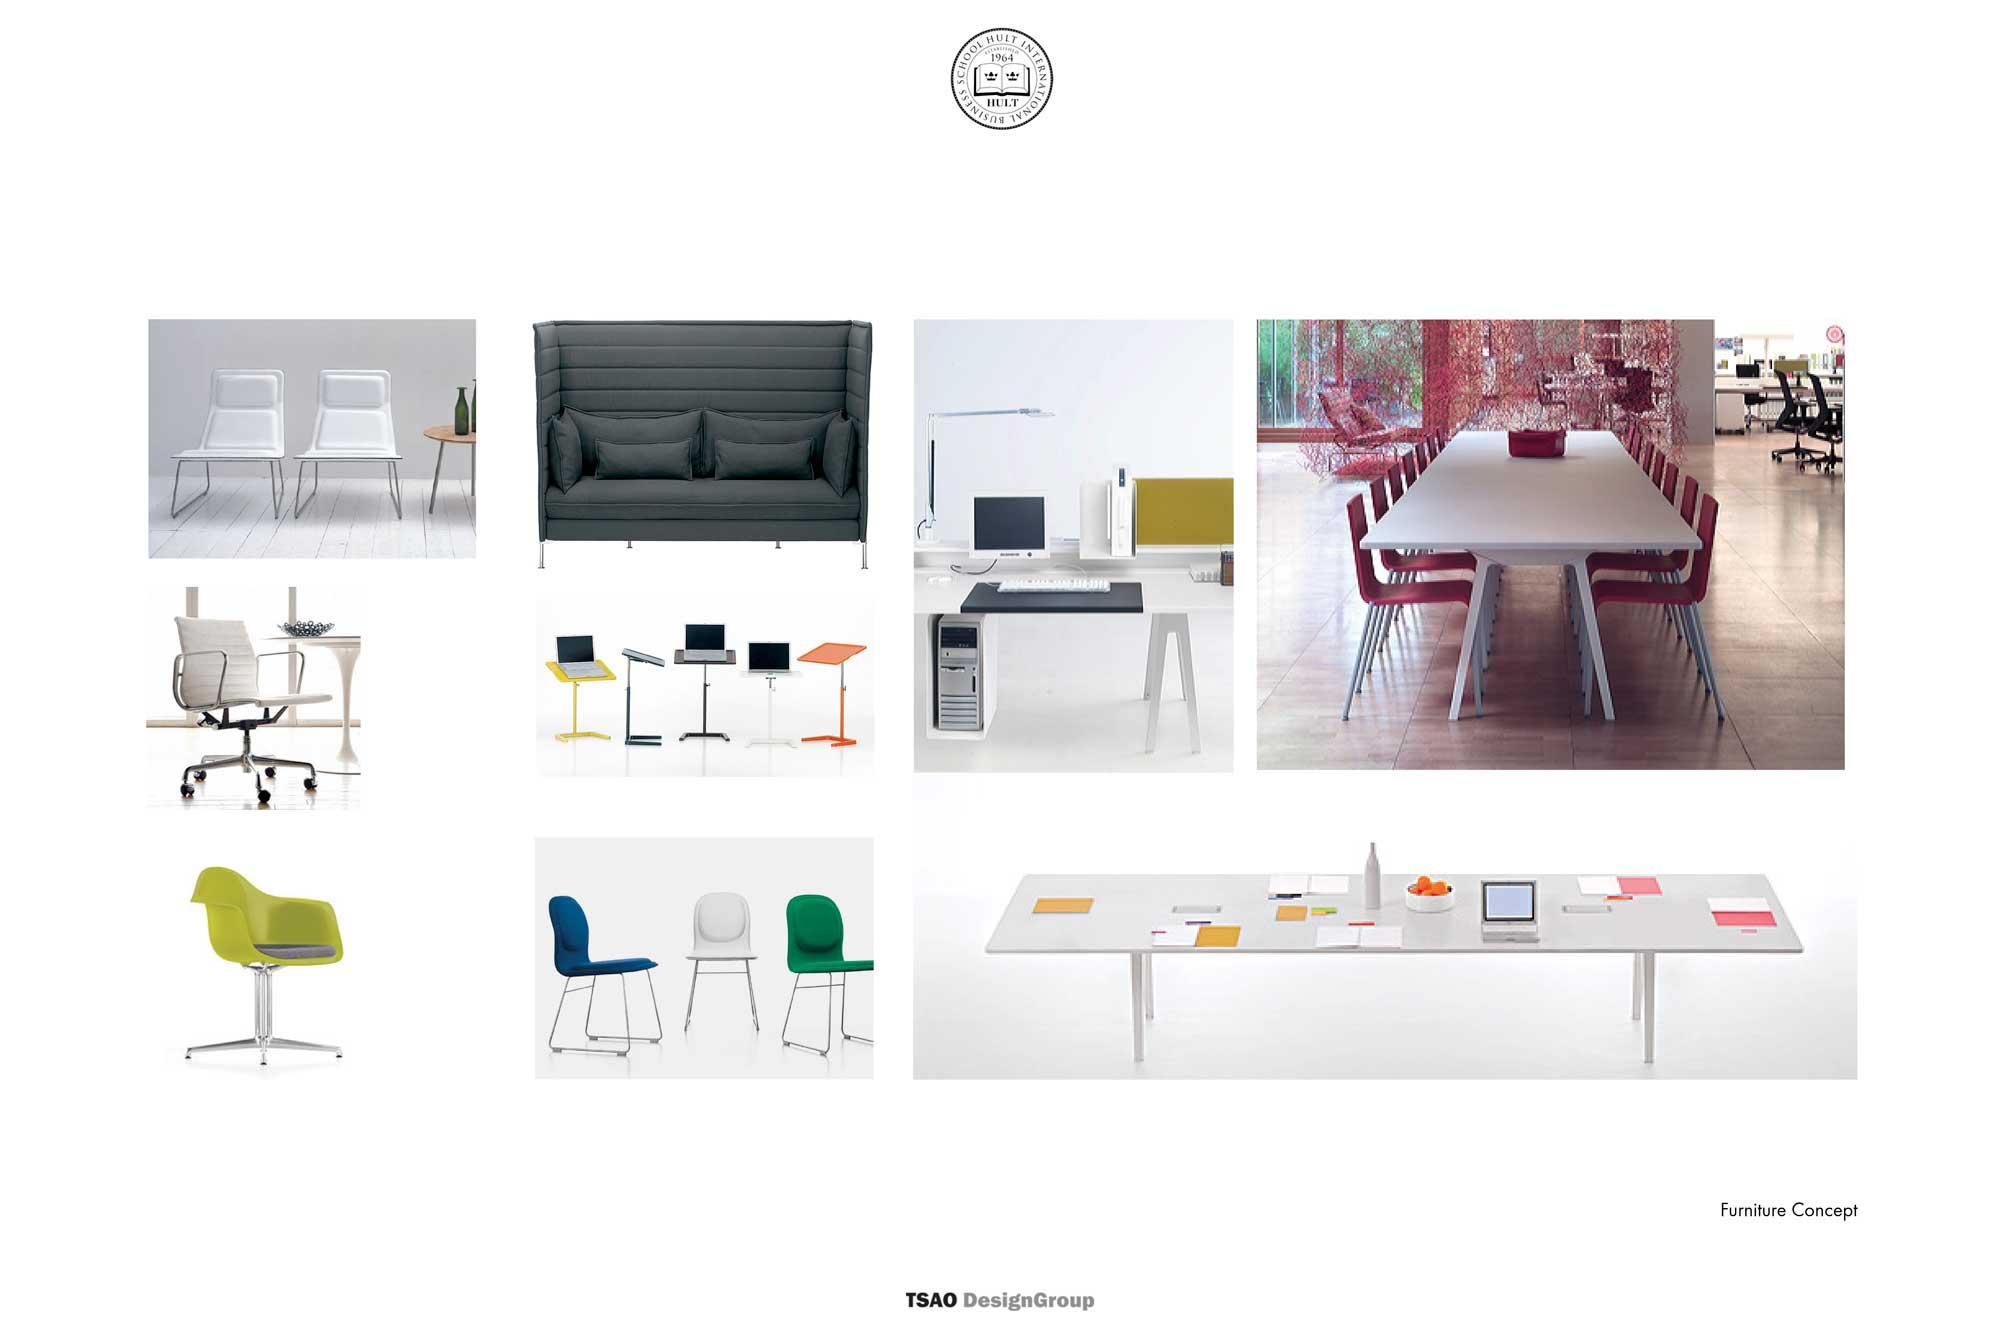 tsao-hult1355-concept-furniture-02.jpg